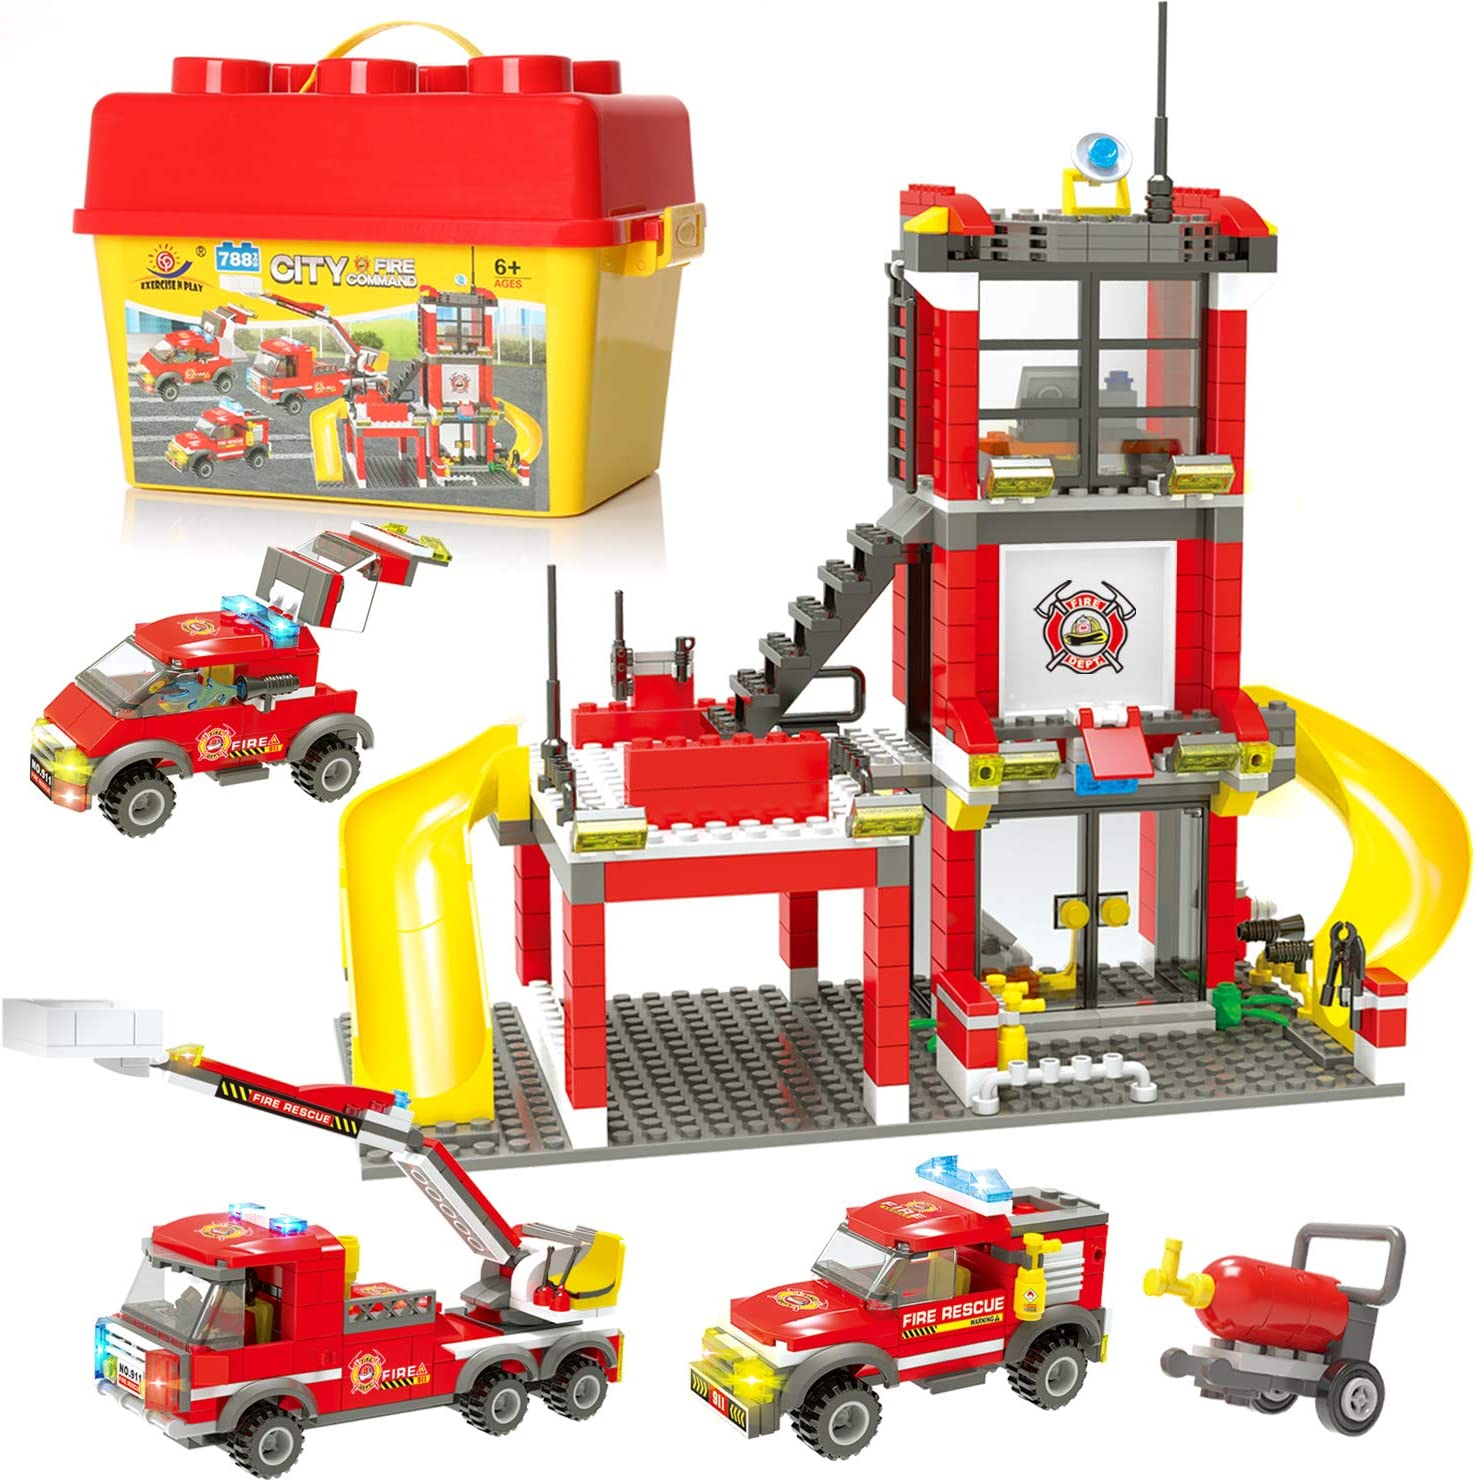 LEGO CITY Lego City Playset Fire Engine 60212 Emergency Rescue New!